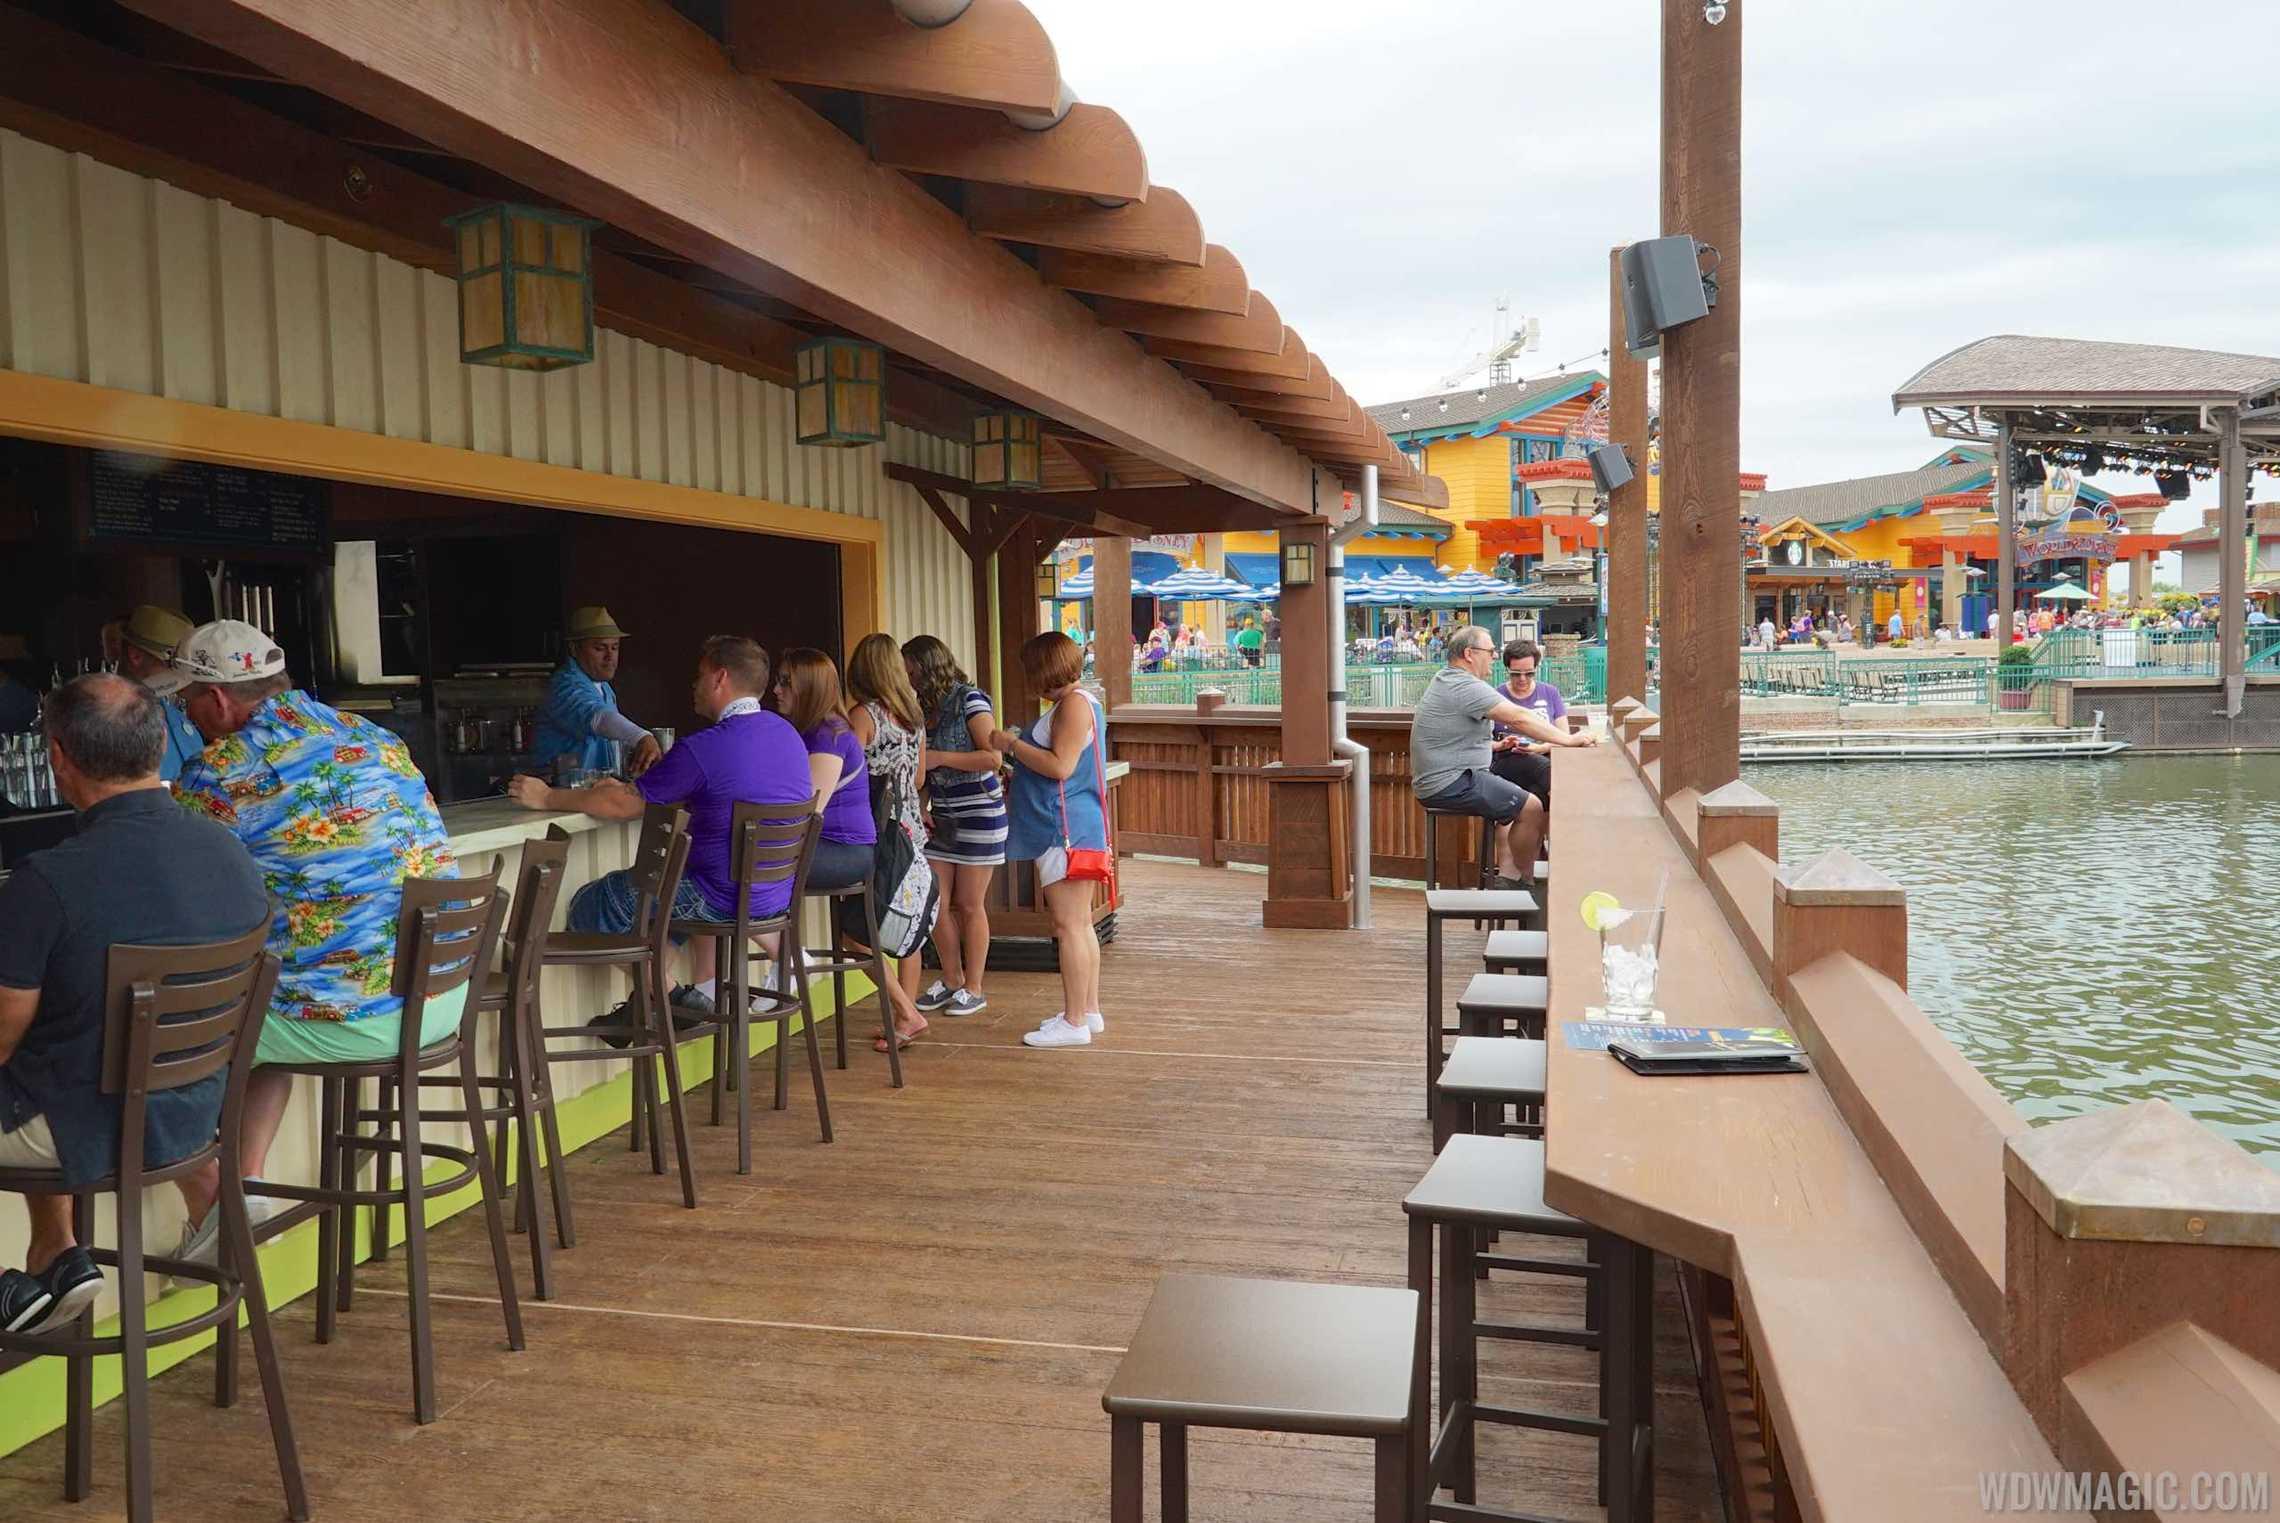 Dockside Margaritas - Bar counter